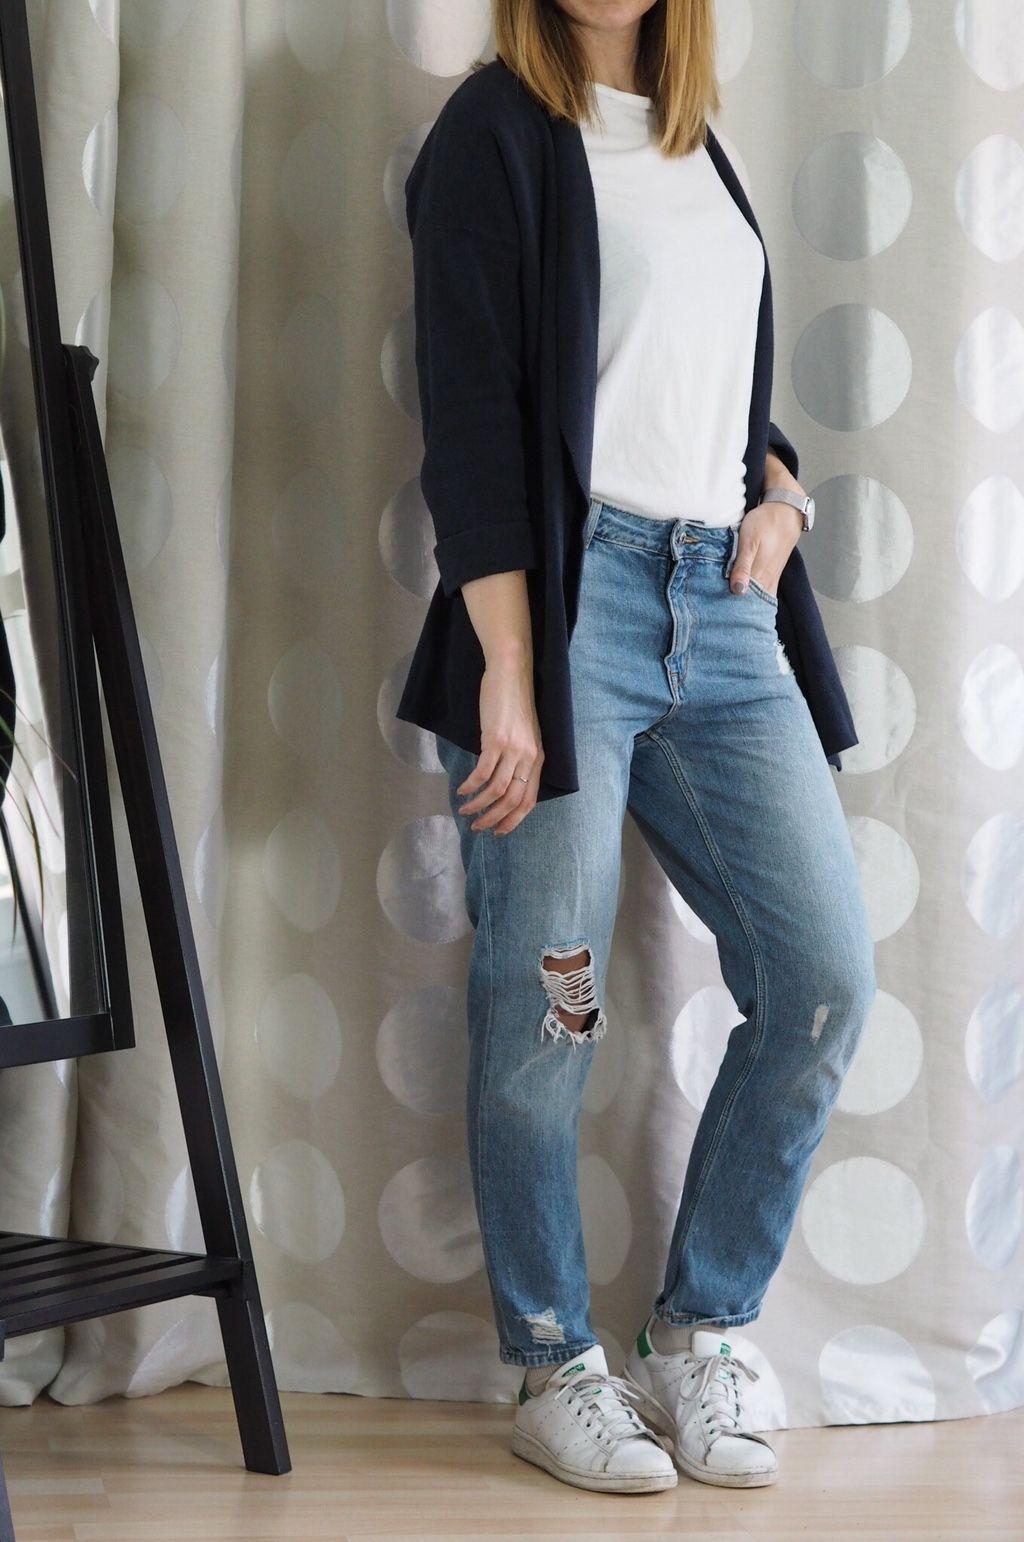 girlfriend jeans cardigan outfit capsule wardrobe herbst. Black Bedroom Furniture Sets. Home Design Ideas